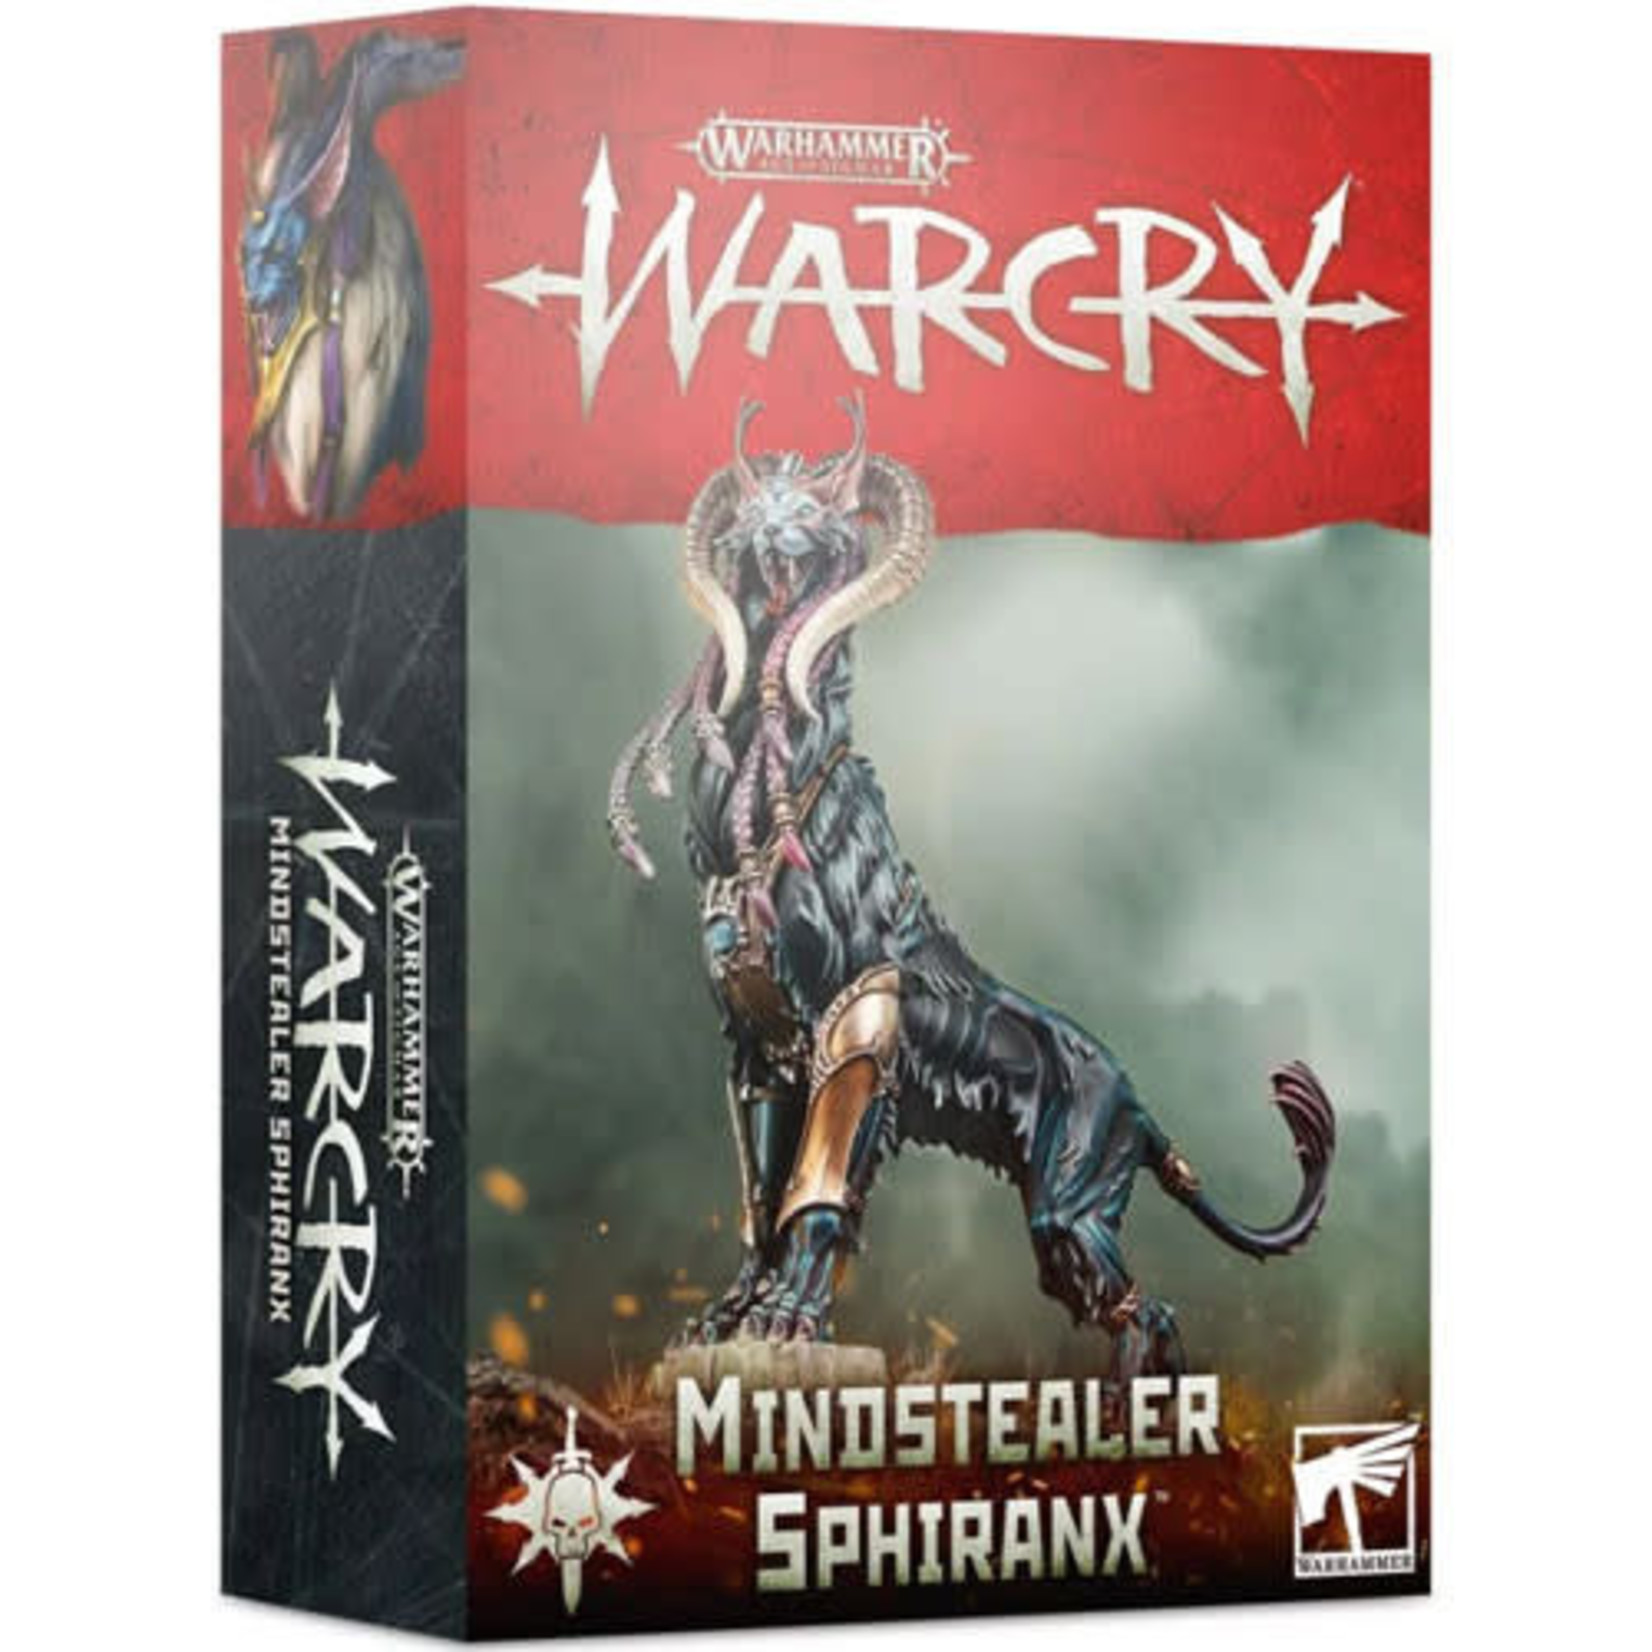 AoS Warcry MindStealer Sphiranx